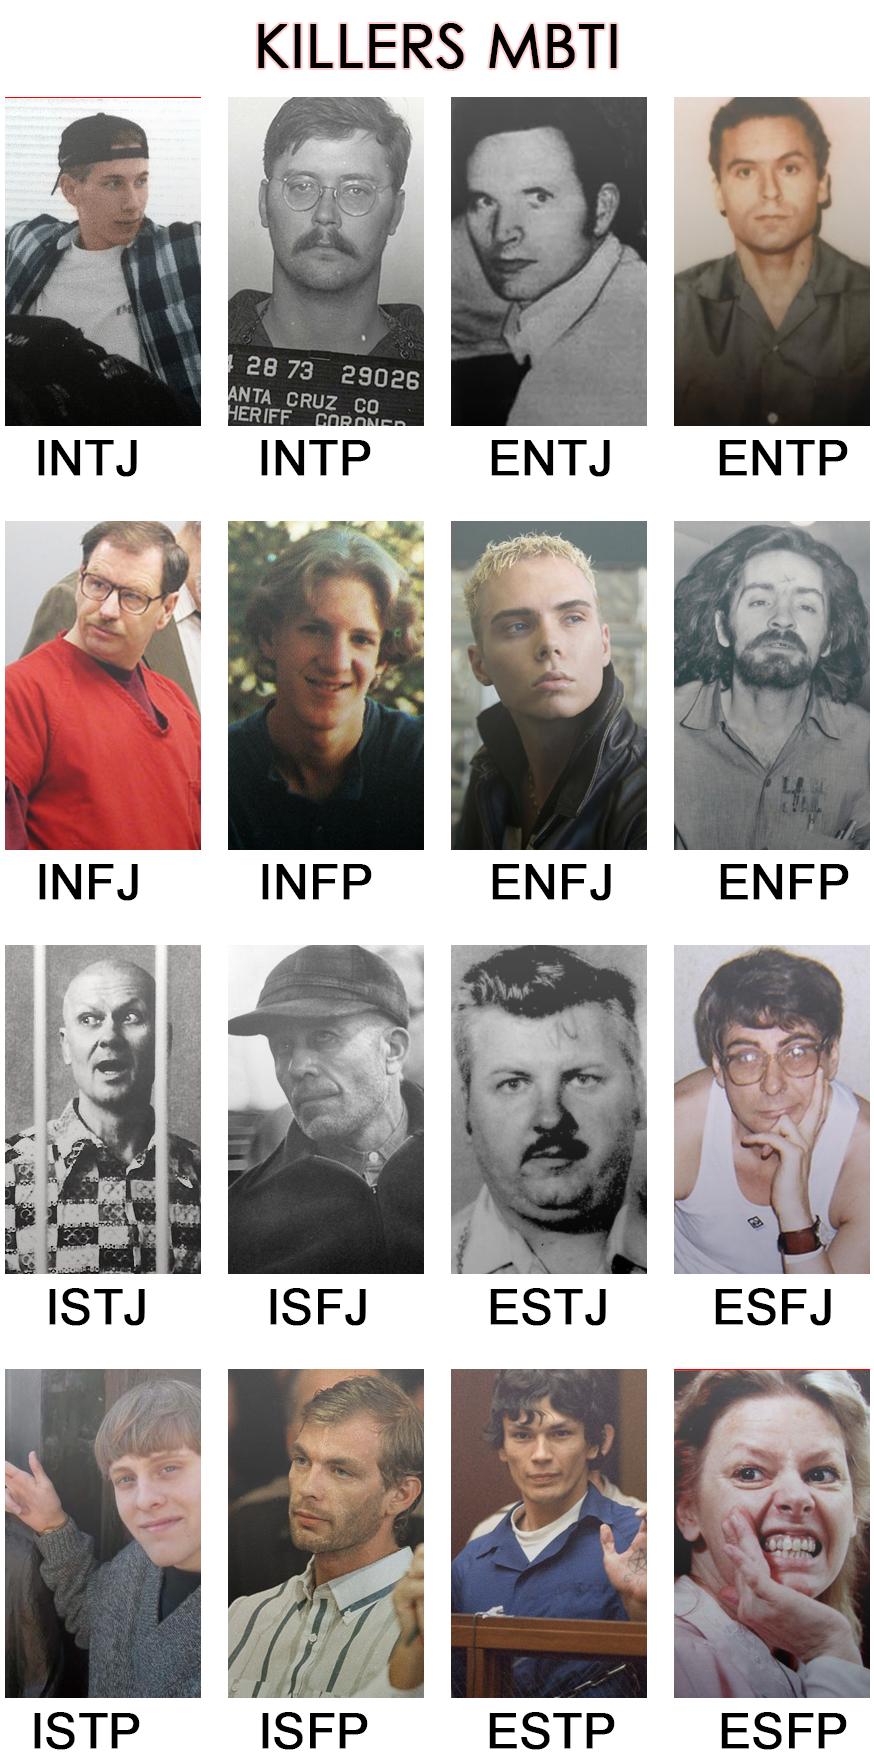 KILLERS MBTI INTJ - Eric Harris INTP - Edmund Kemper ENTJ - Dean